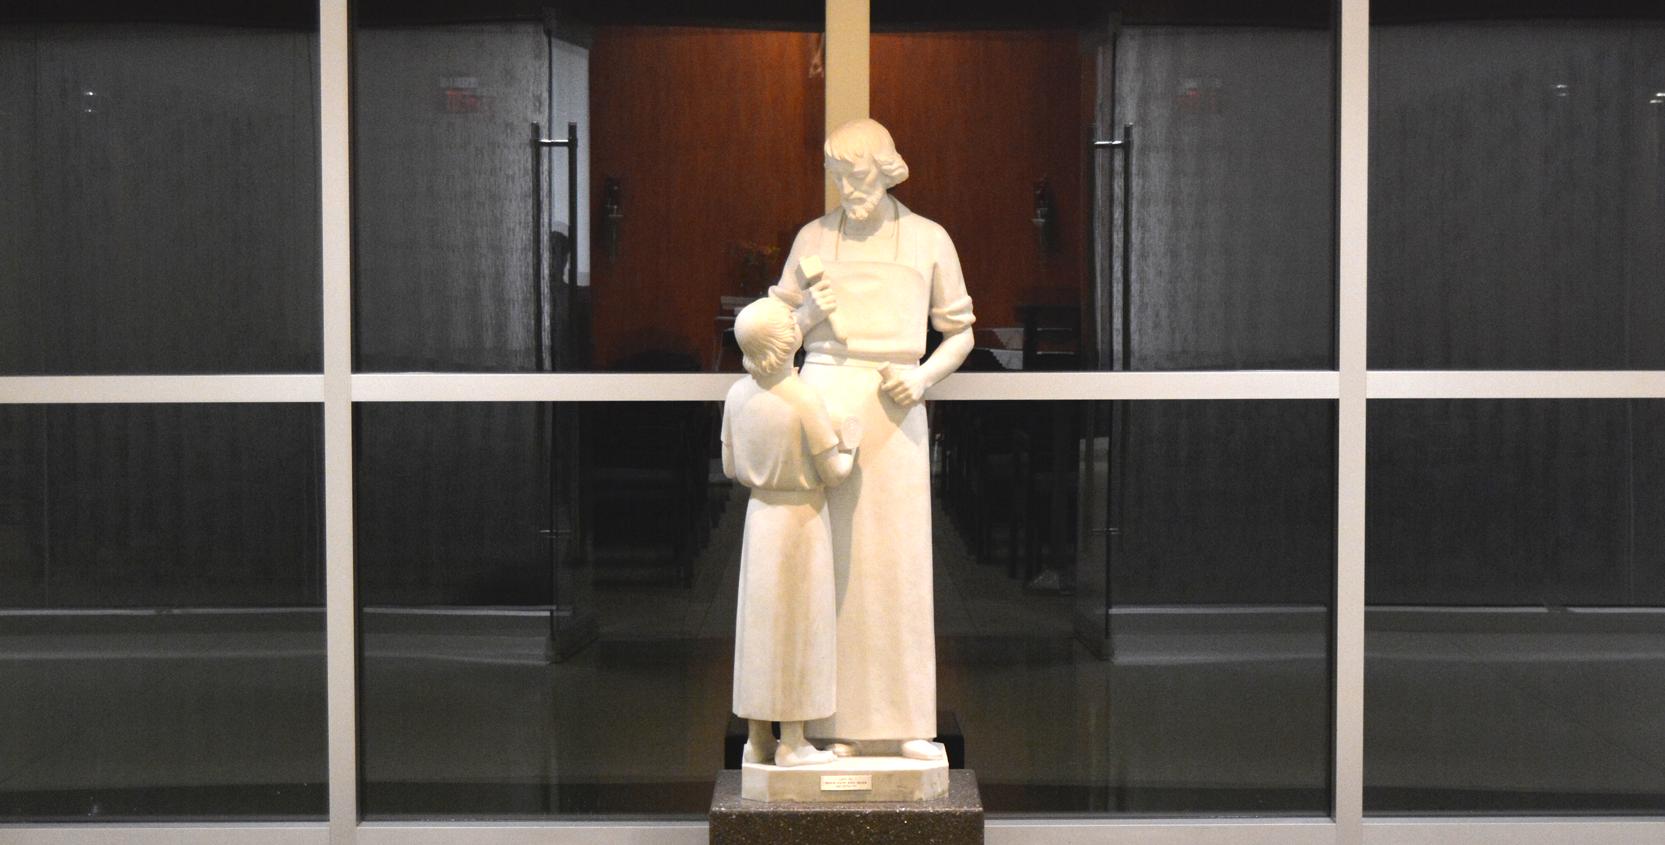 St-Joseph-Mercy-Oakland-South-Patient-Tower-Chapel-Statue-1665x845